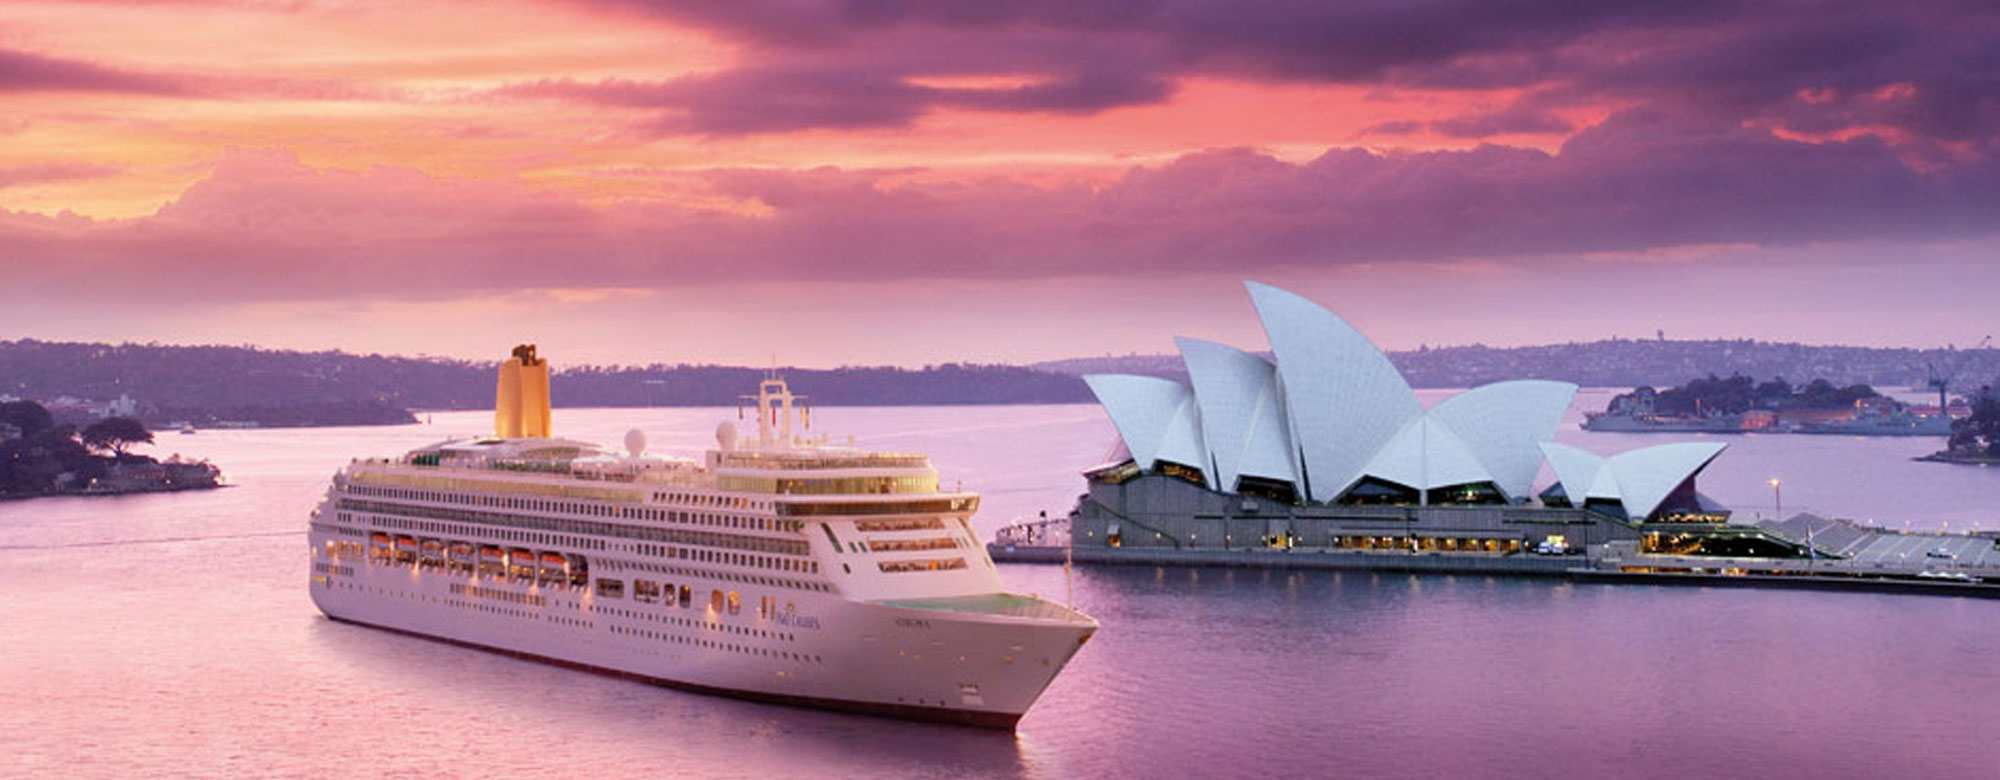 p&o Ocean Liner sydney opera house